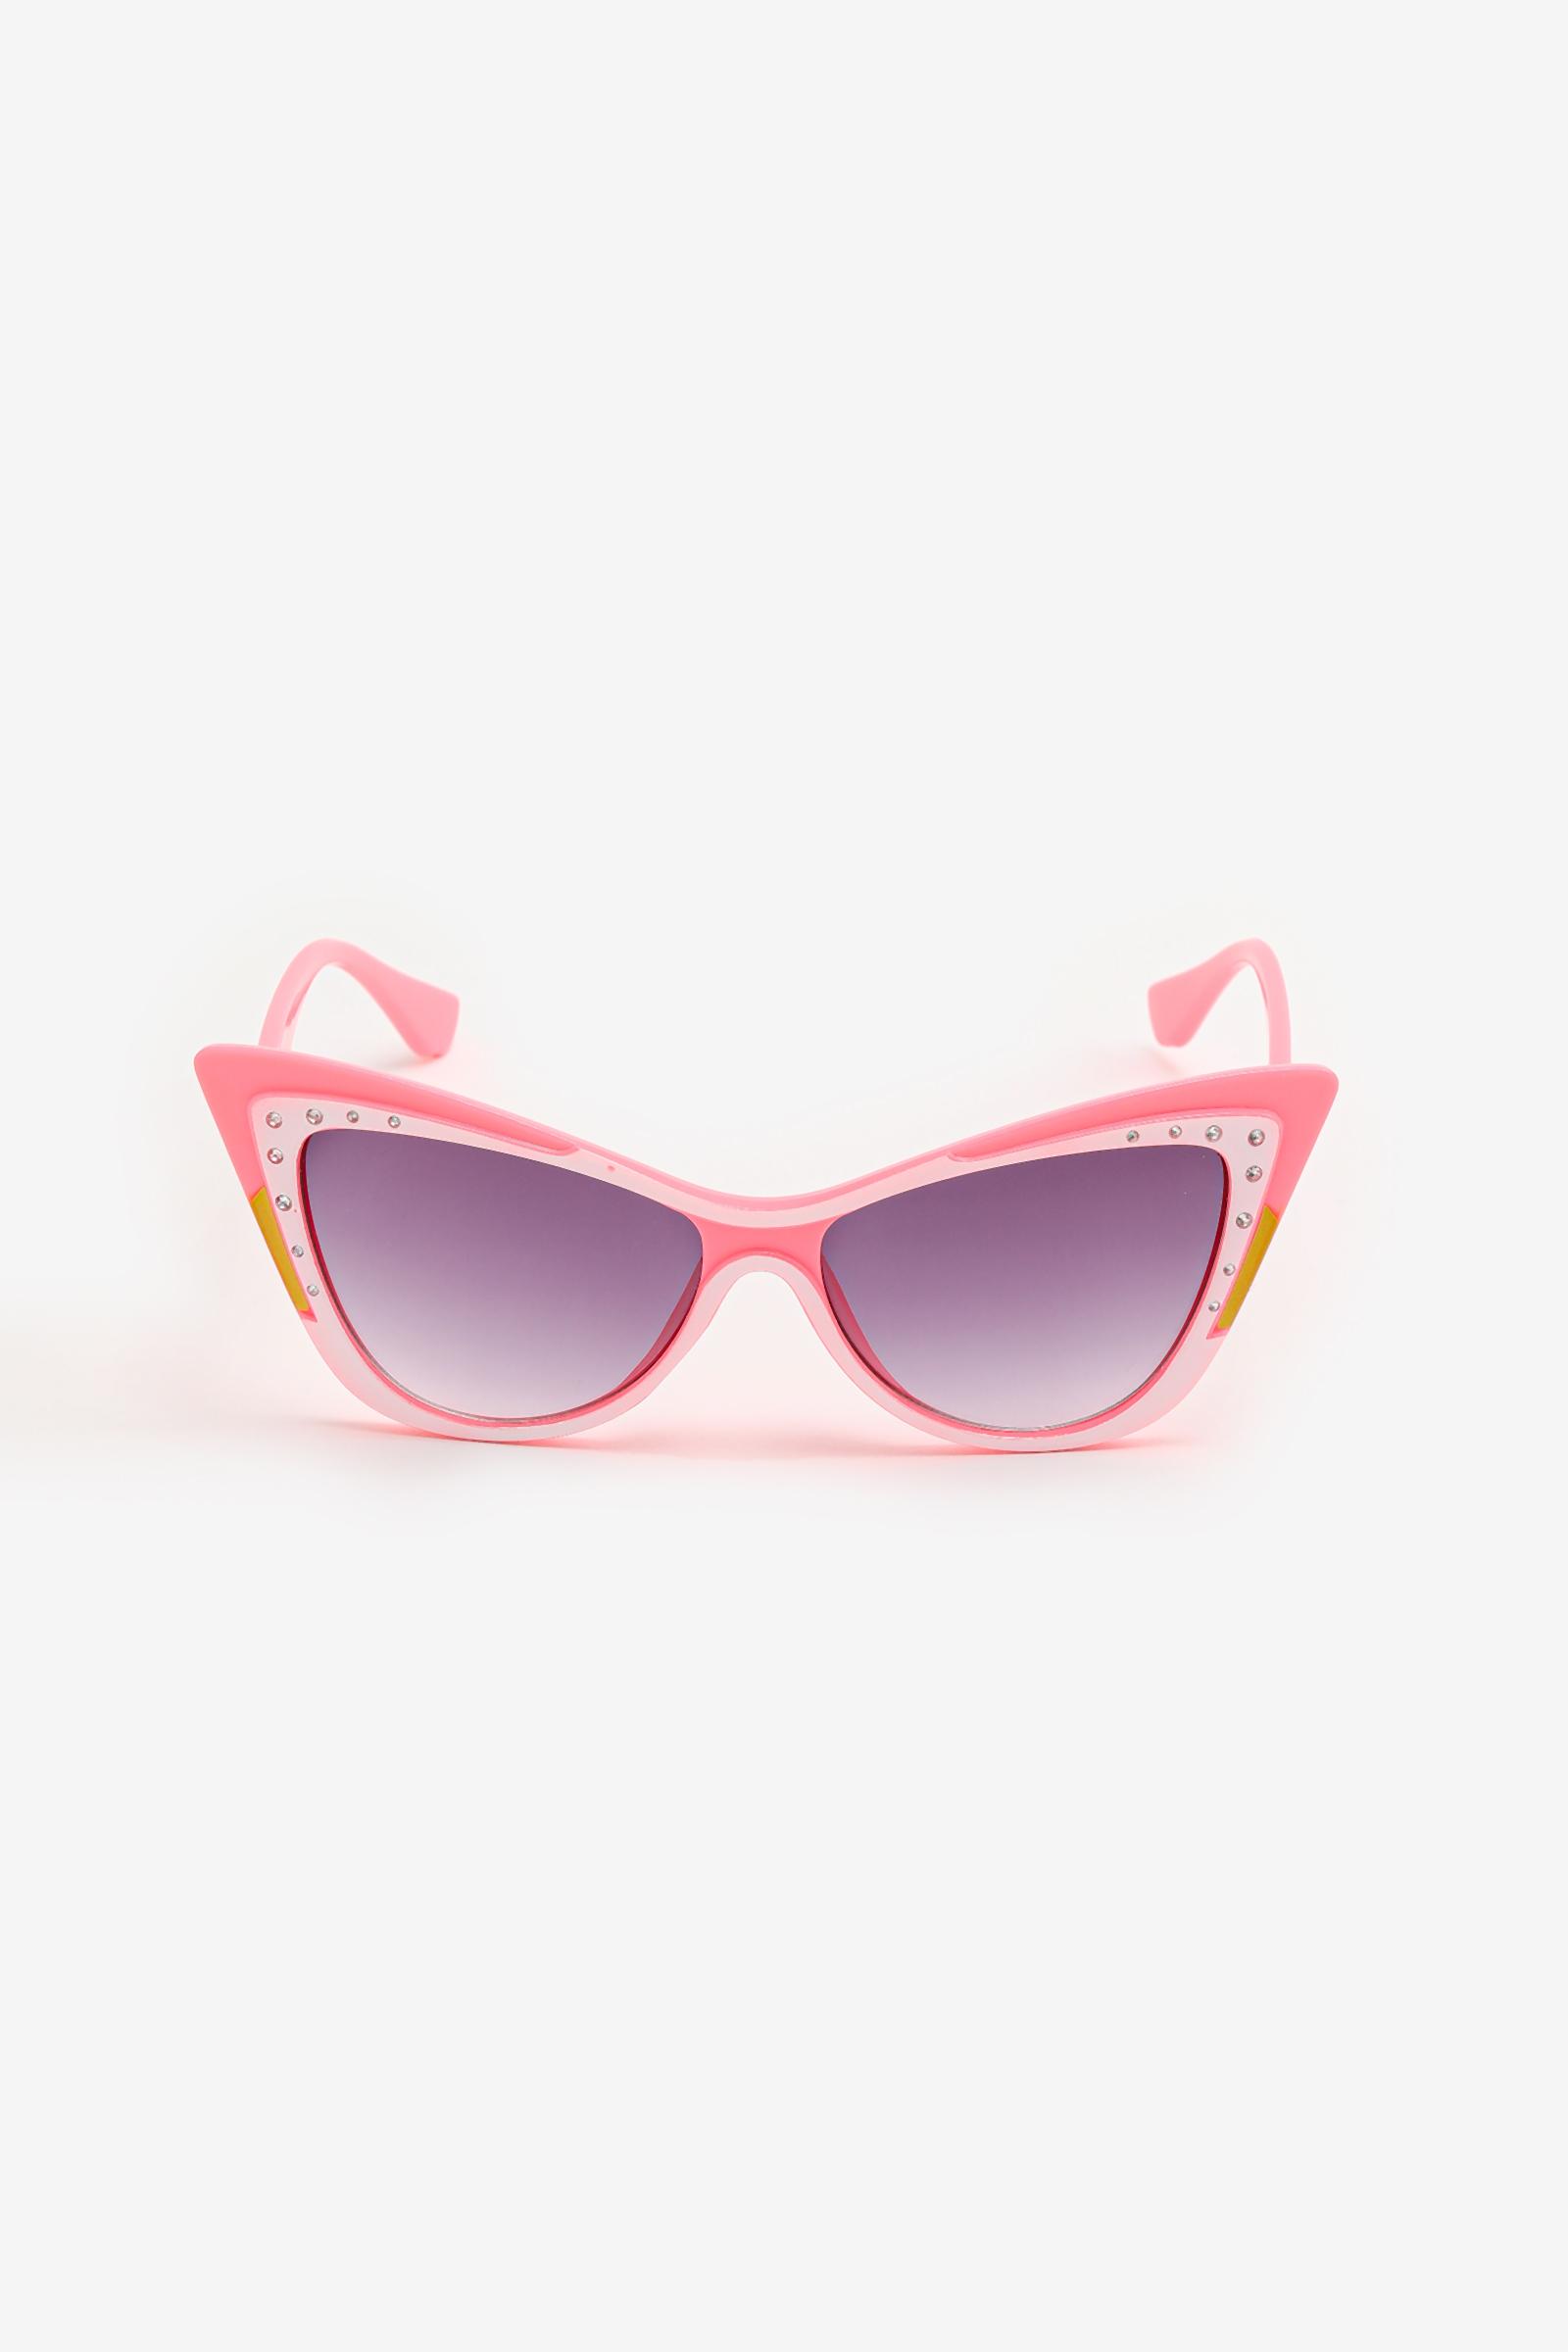 2 Tone Cat Eye Sunglasses for Kids